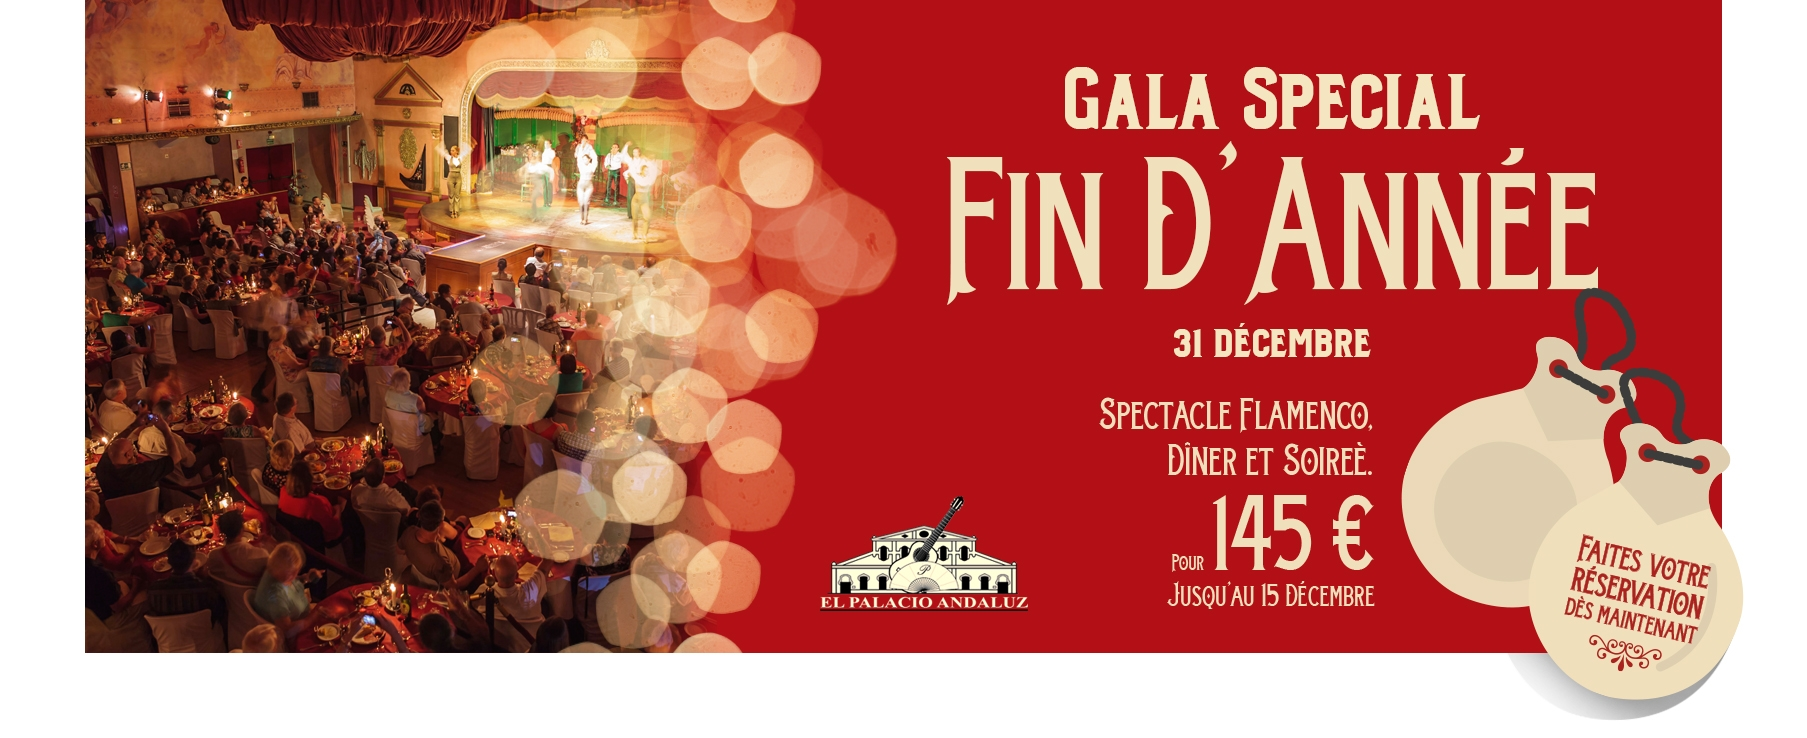 Gala Special Fin d' Année Seville